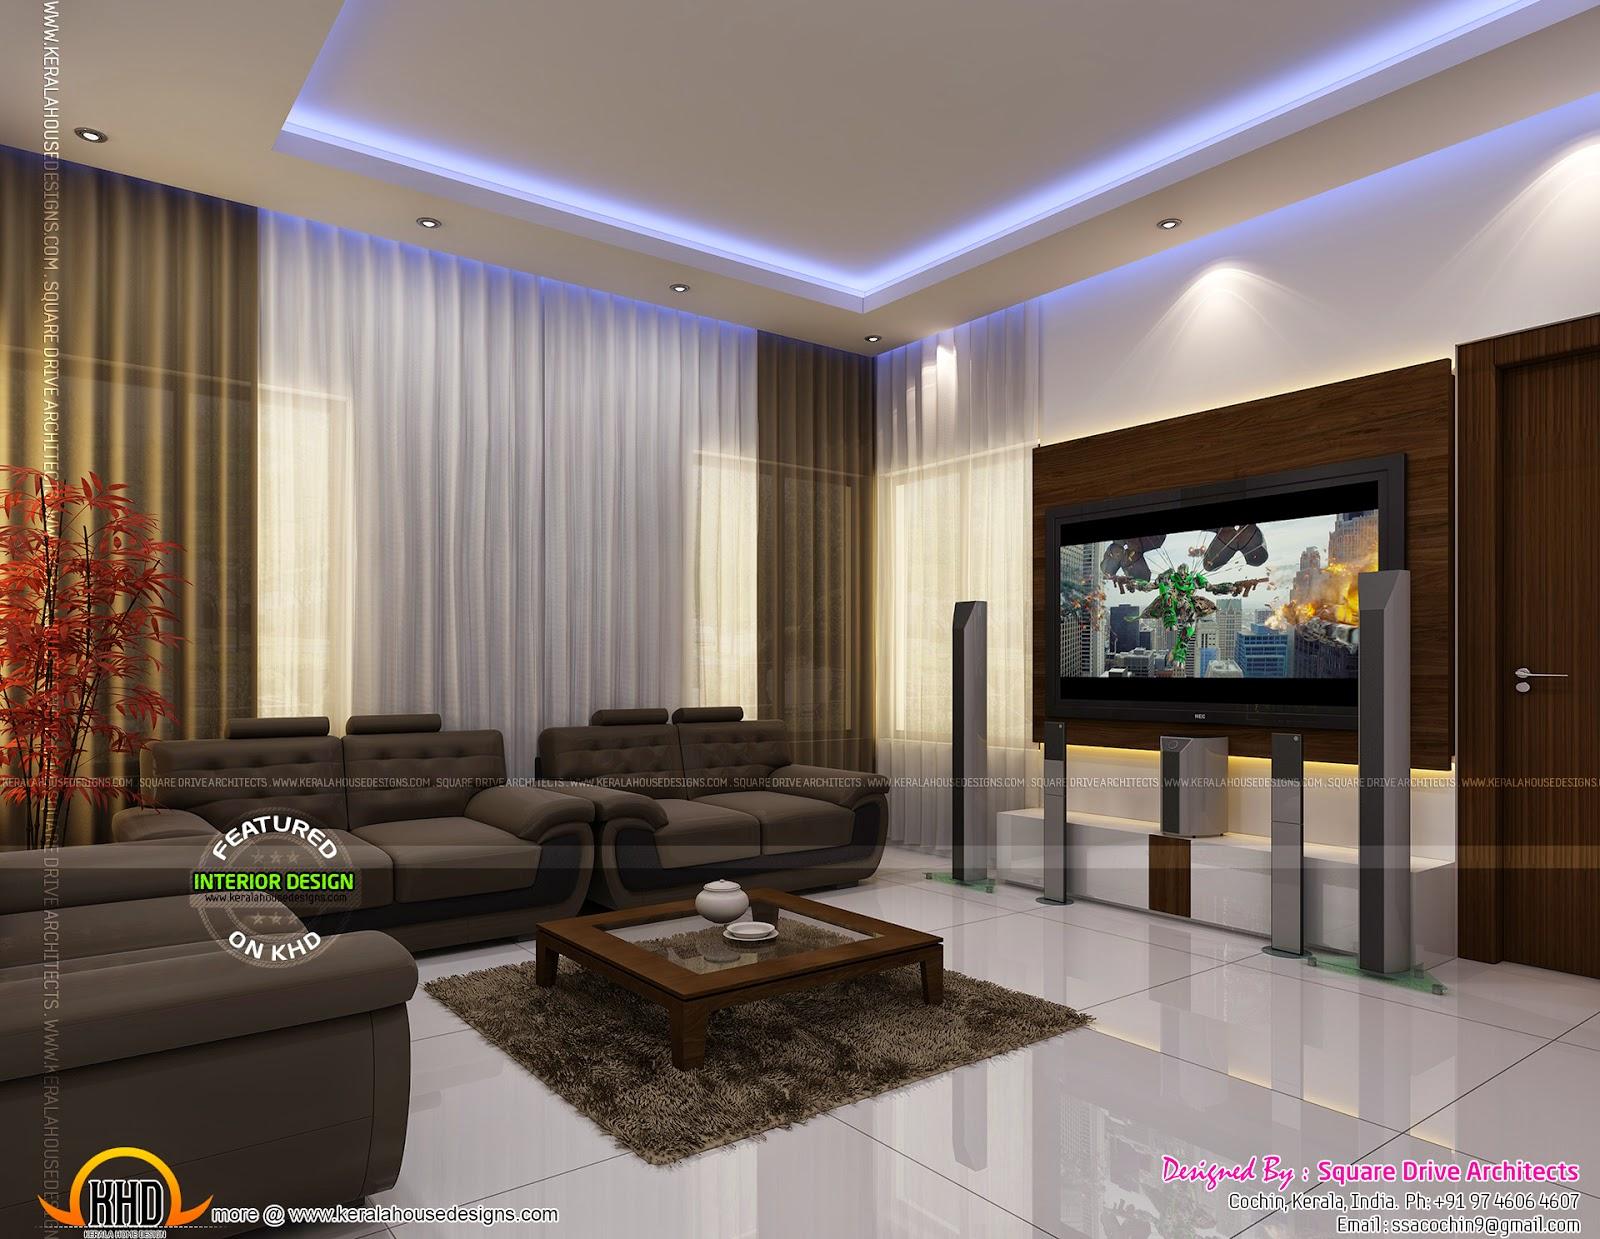 Home interiors designs - Kerala home design and floor ...